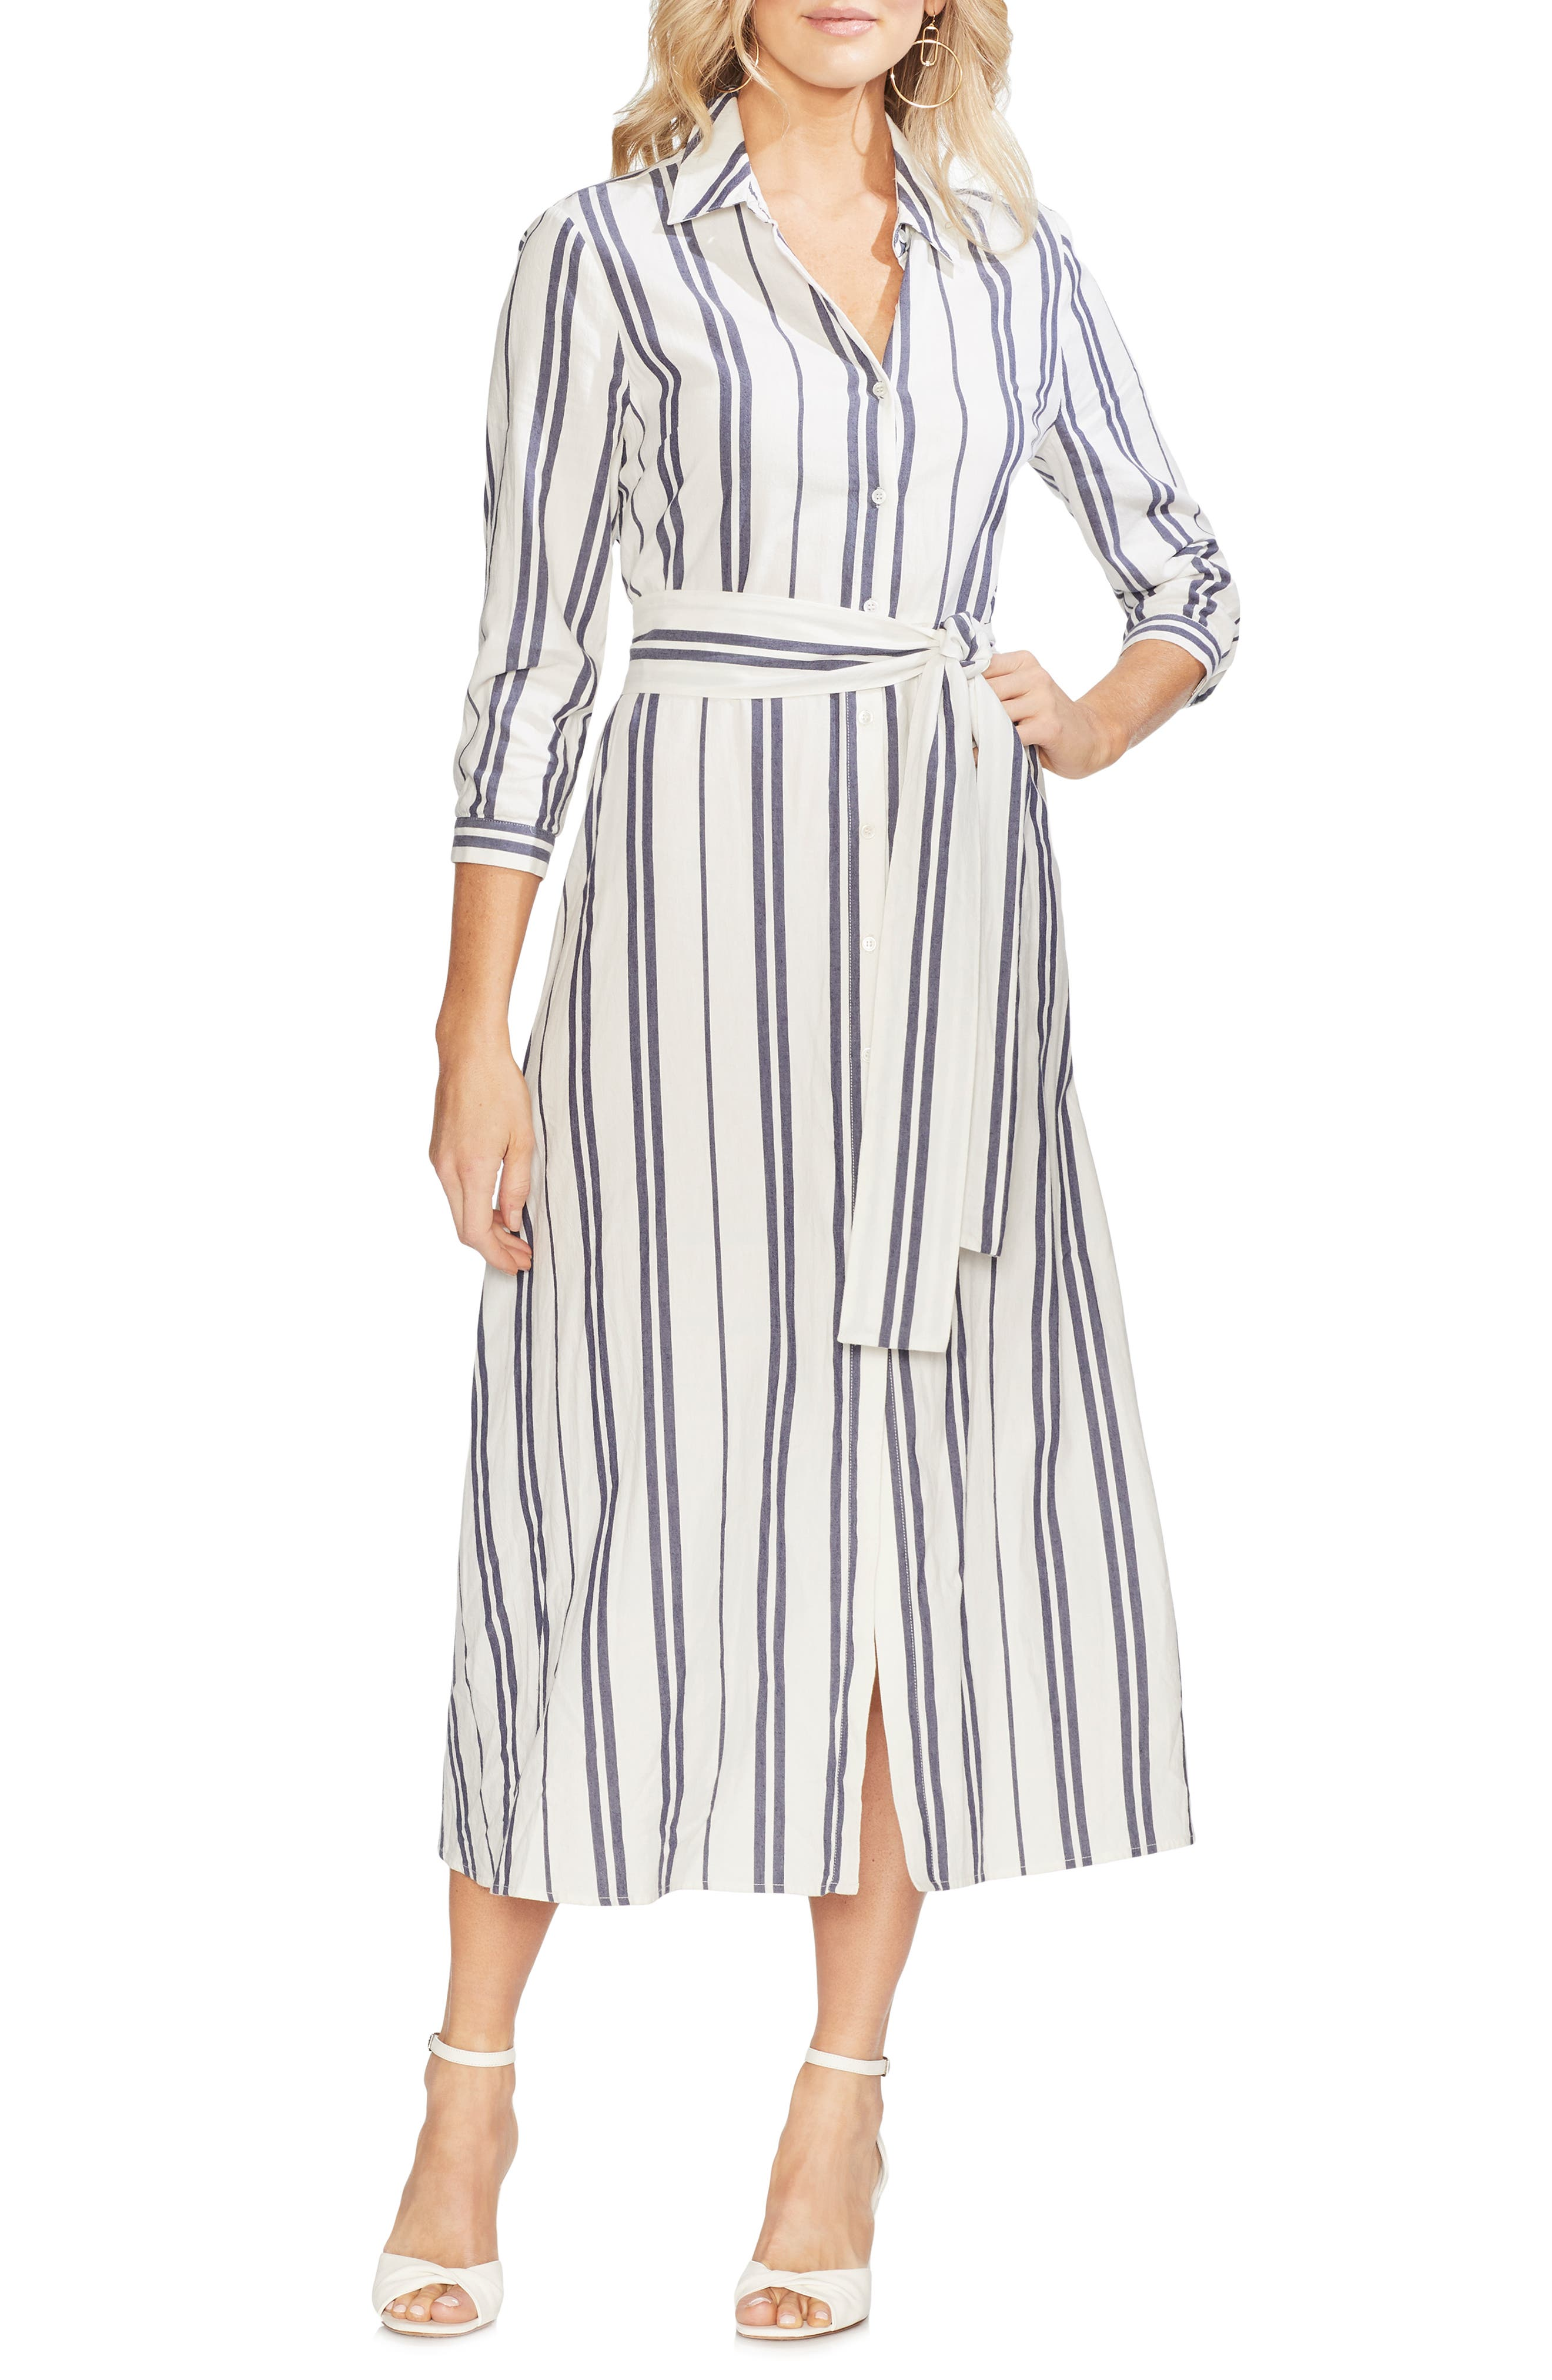 VINCE CAMUTO, Valiant Stripe Midi Shirtdress, Main thumbnail 1, color, PEARL IVORY